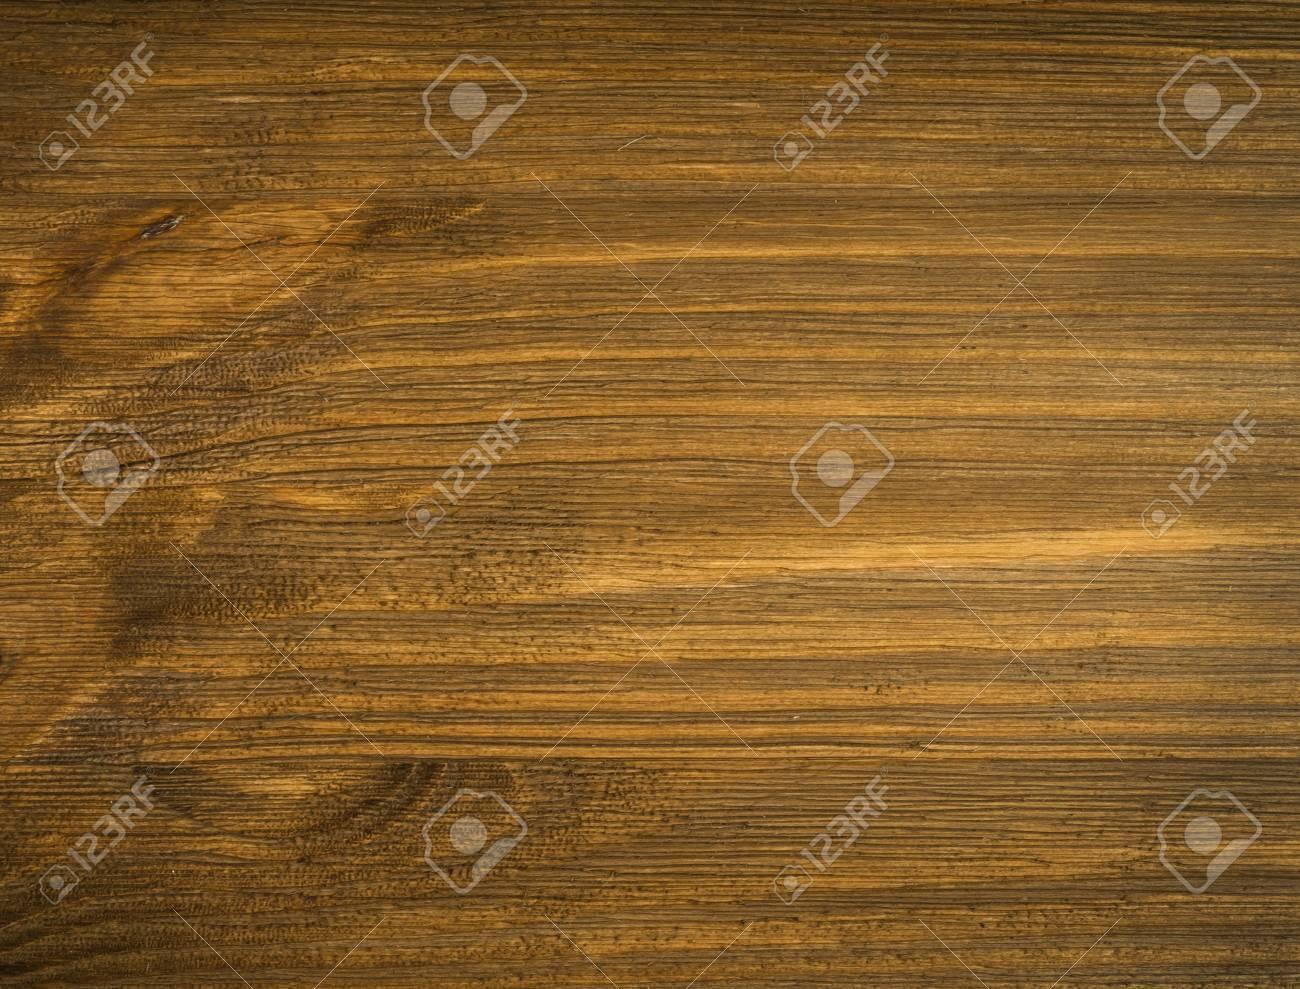 Old Wooden Texture Top View Dark Brown Wood Grain Background